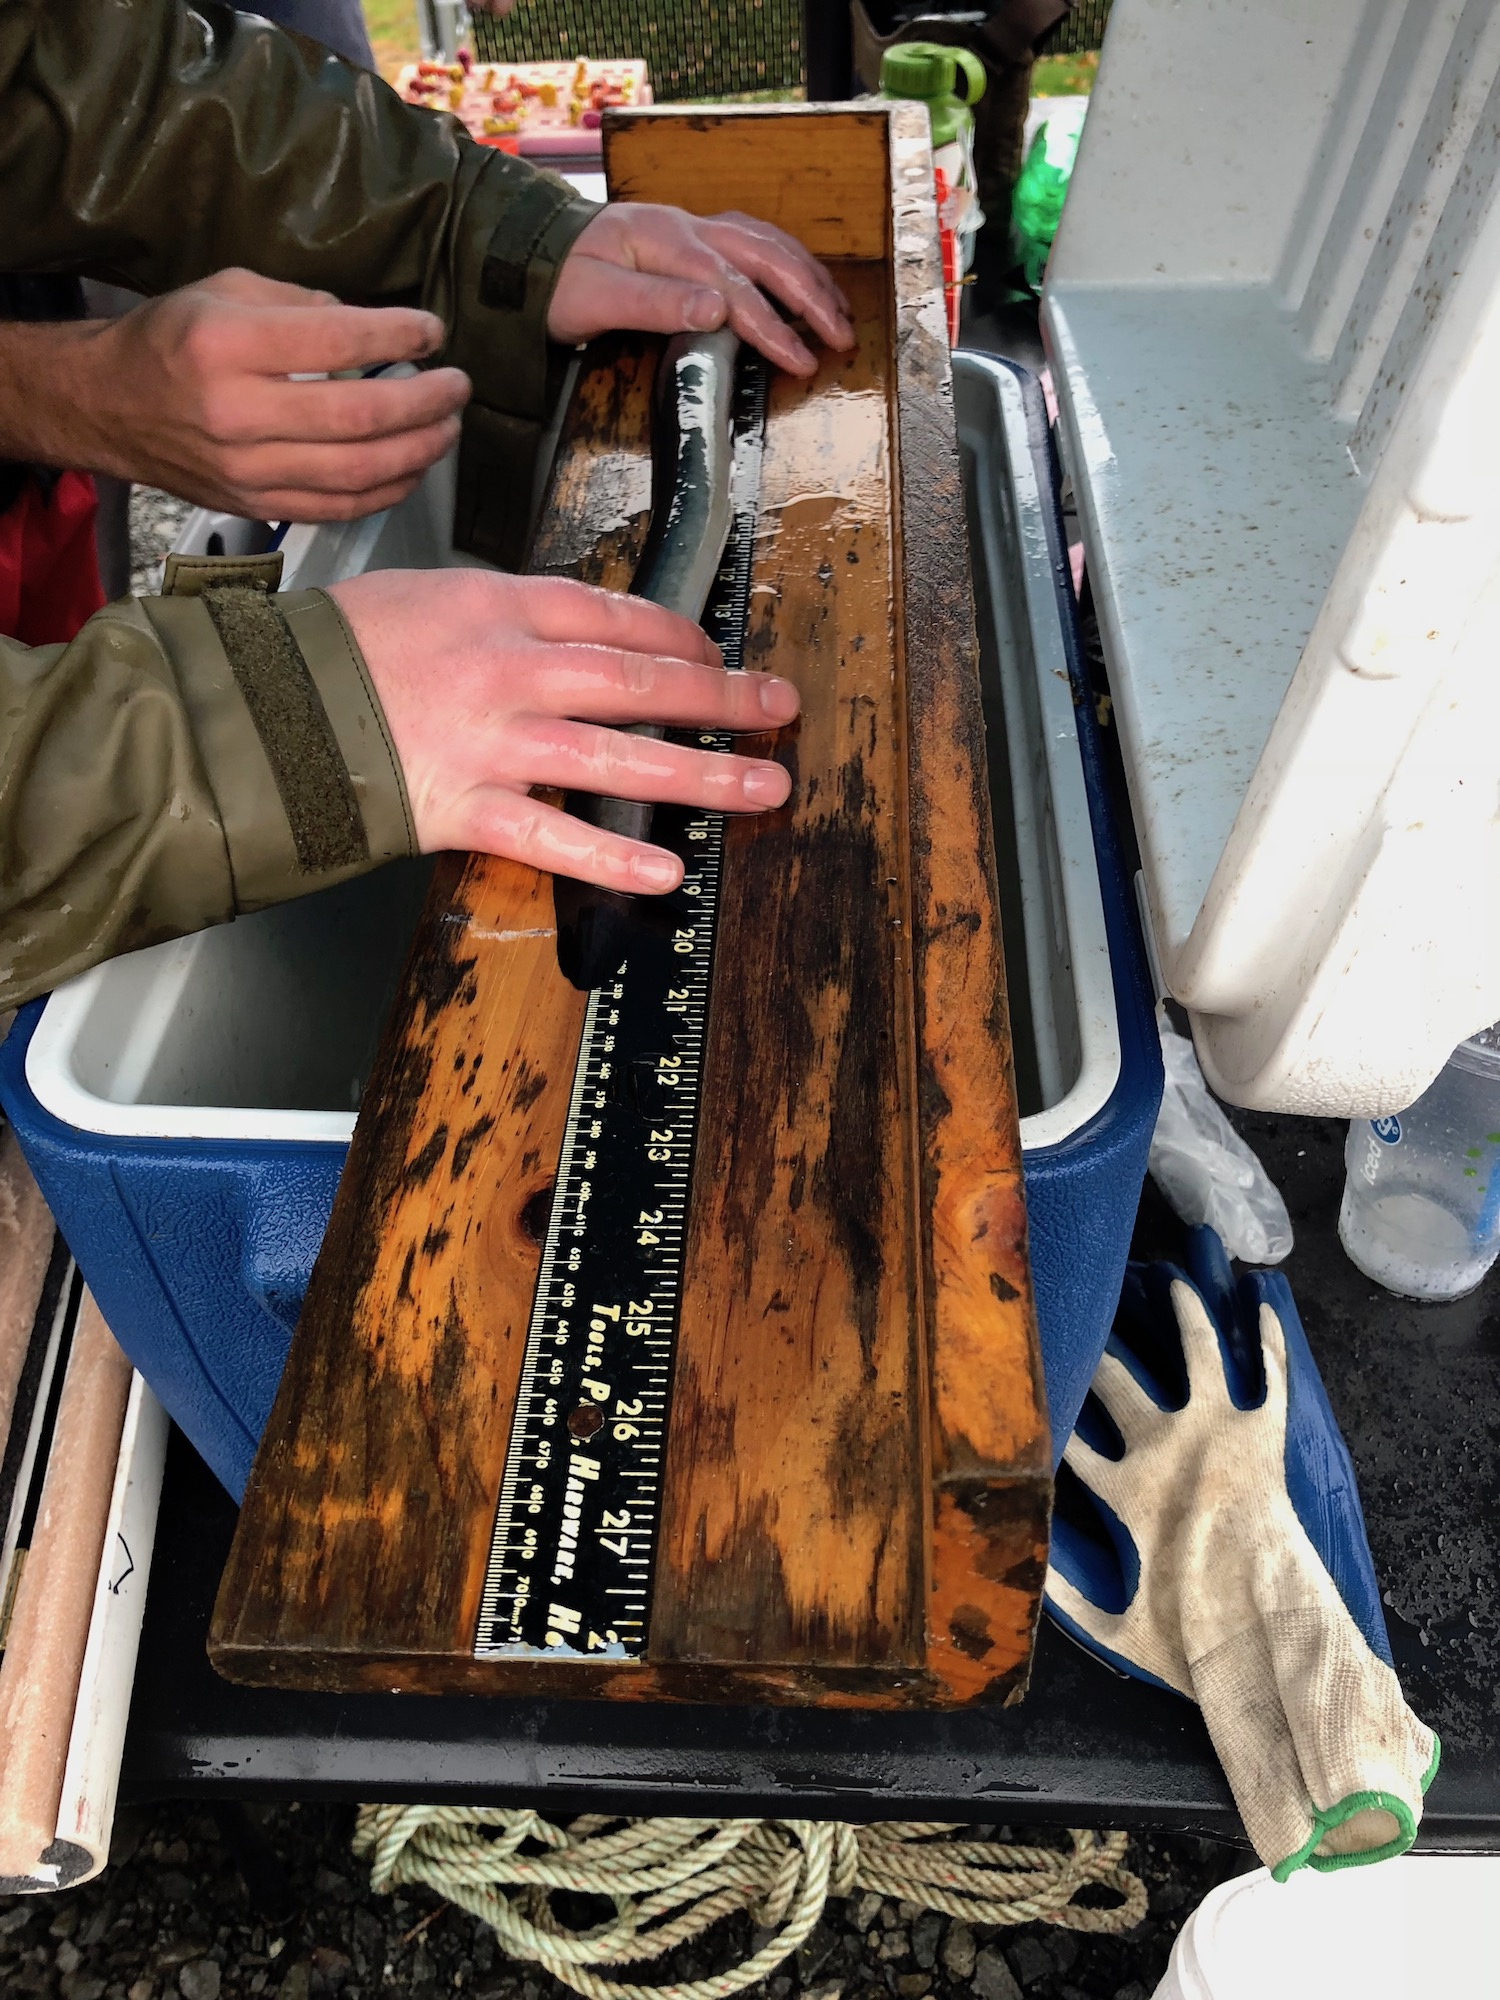 Eel survivability studies, measuring eels